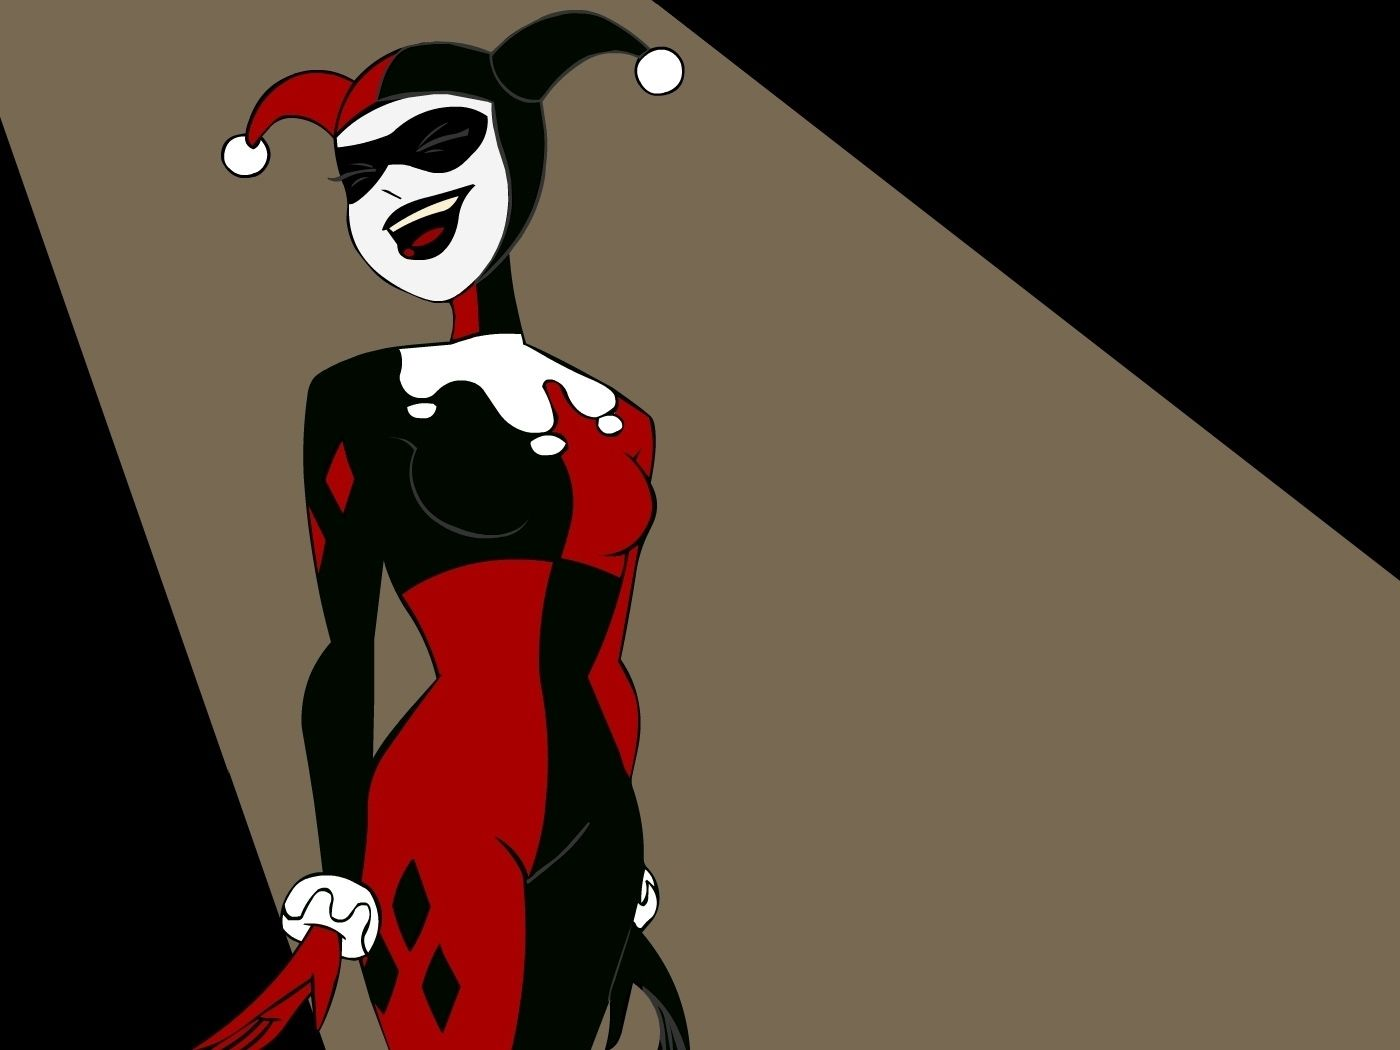 Joker Girl Wallpapers Top Free Joker Girl Backgrounds Wallpaperaccess